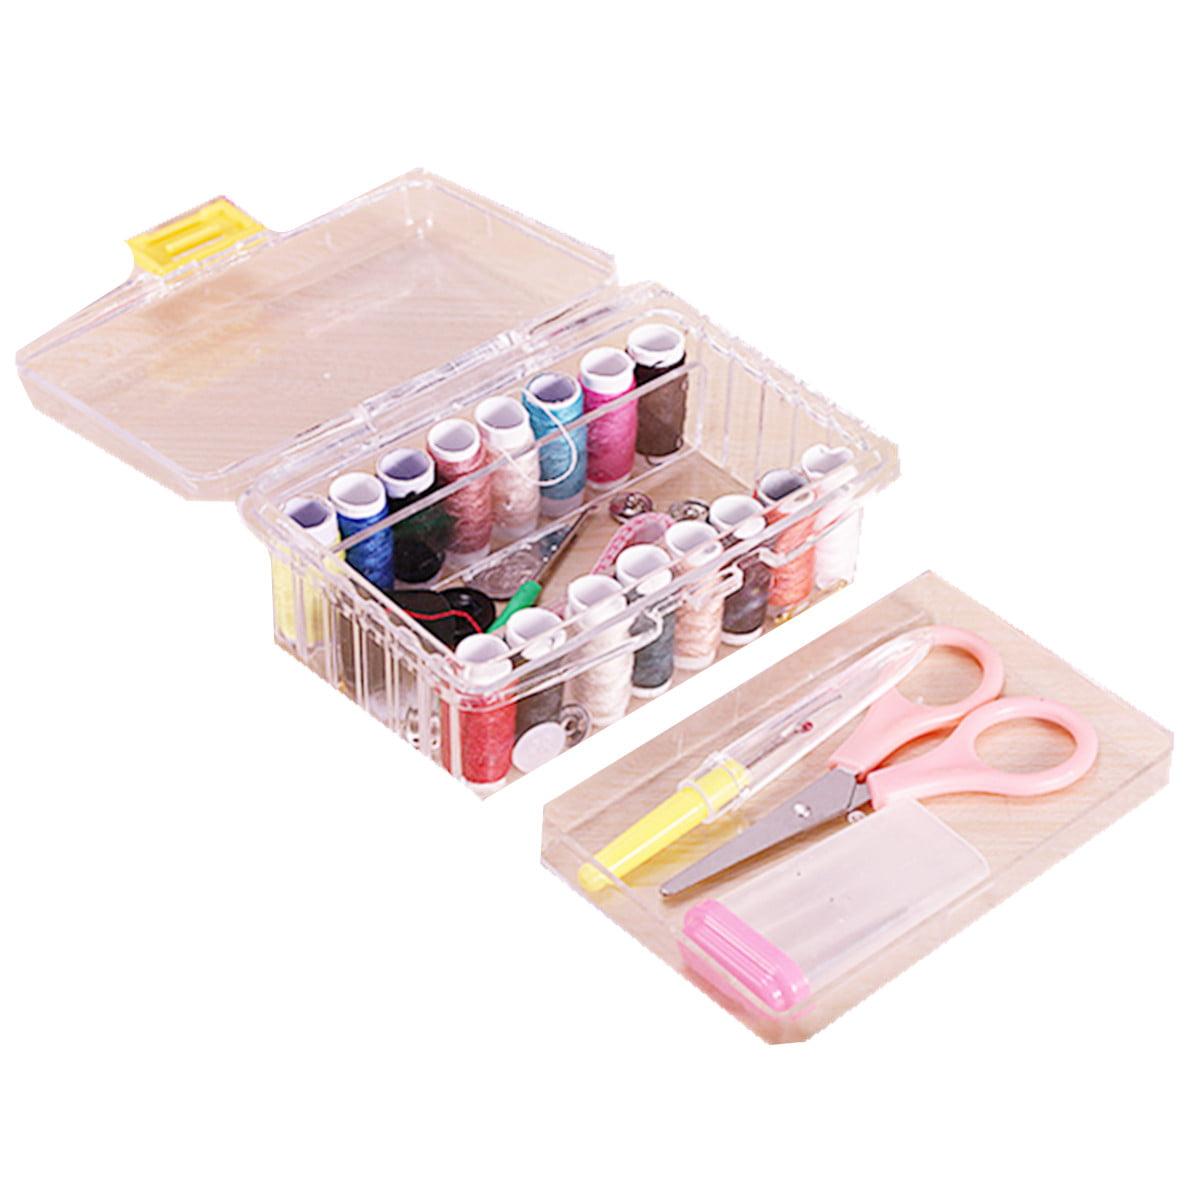 Meigar Sewing Kits Repair Travel Case Thread Threader Needle Tape ...